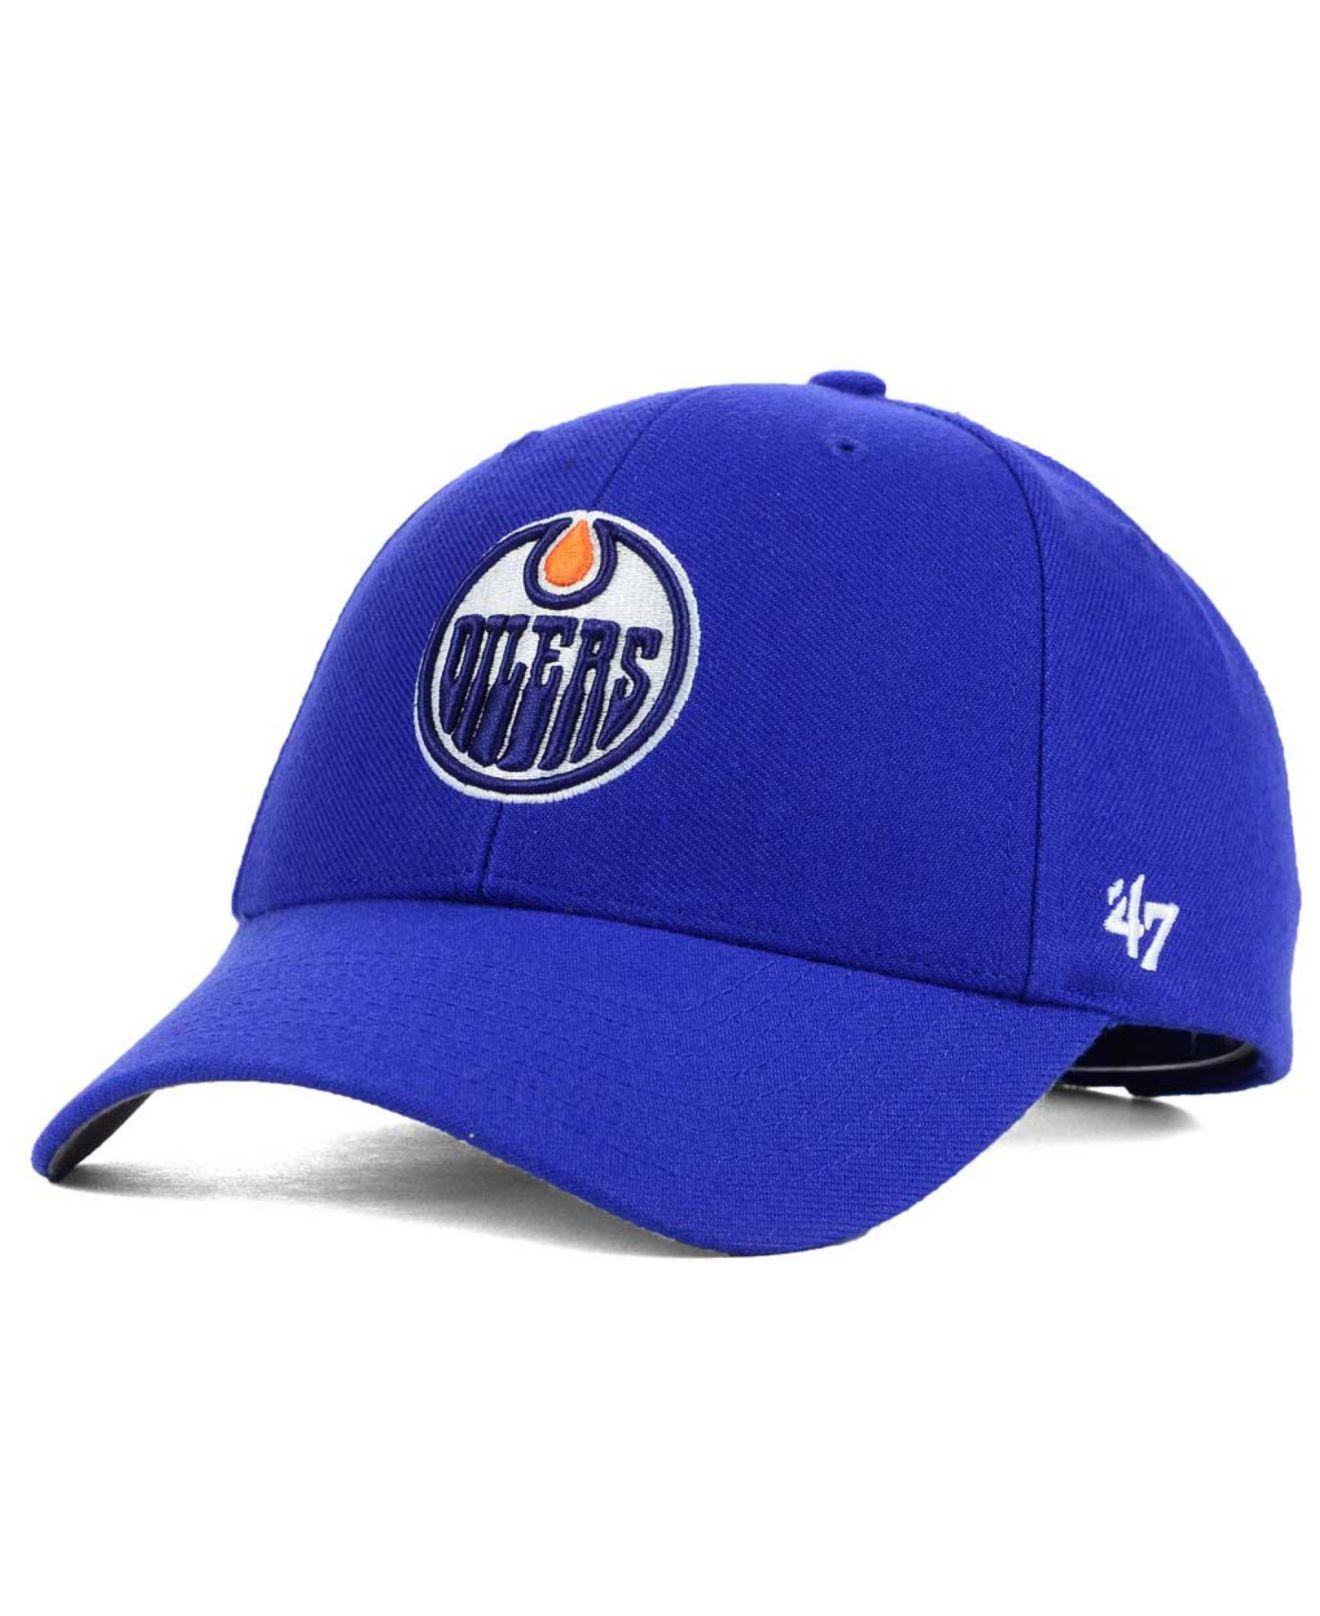 d68d0a9cbda7ed 47 Brand Edmonton Oilers Curved Mvp Cap in Blue for Men - Lyst